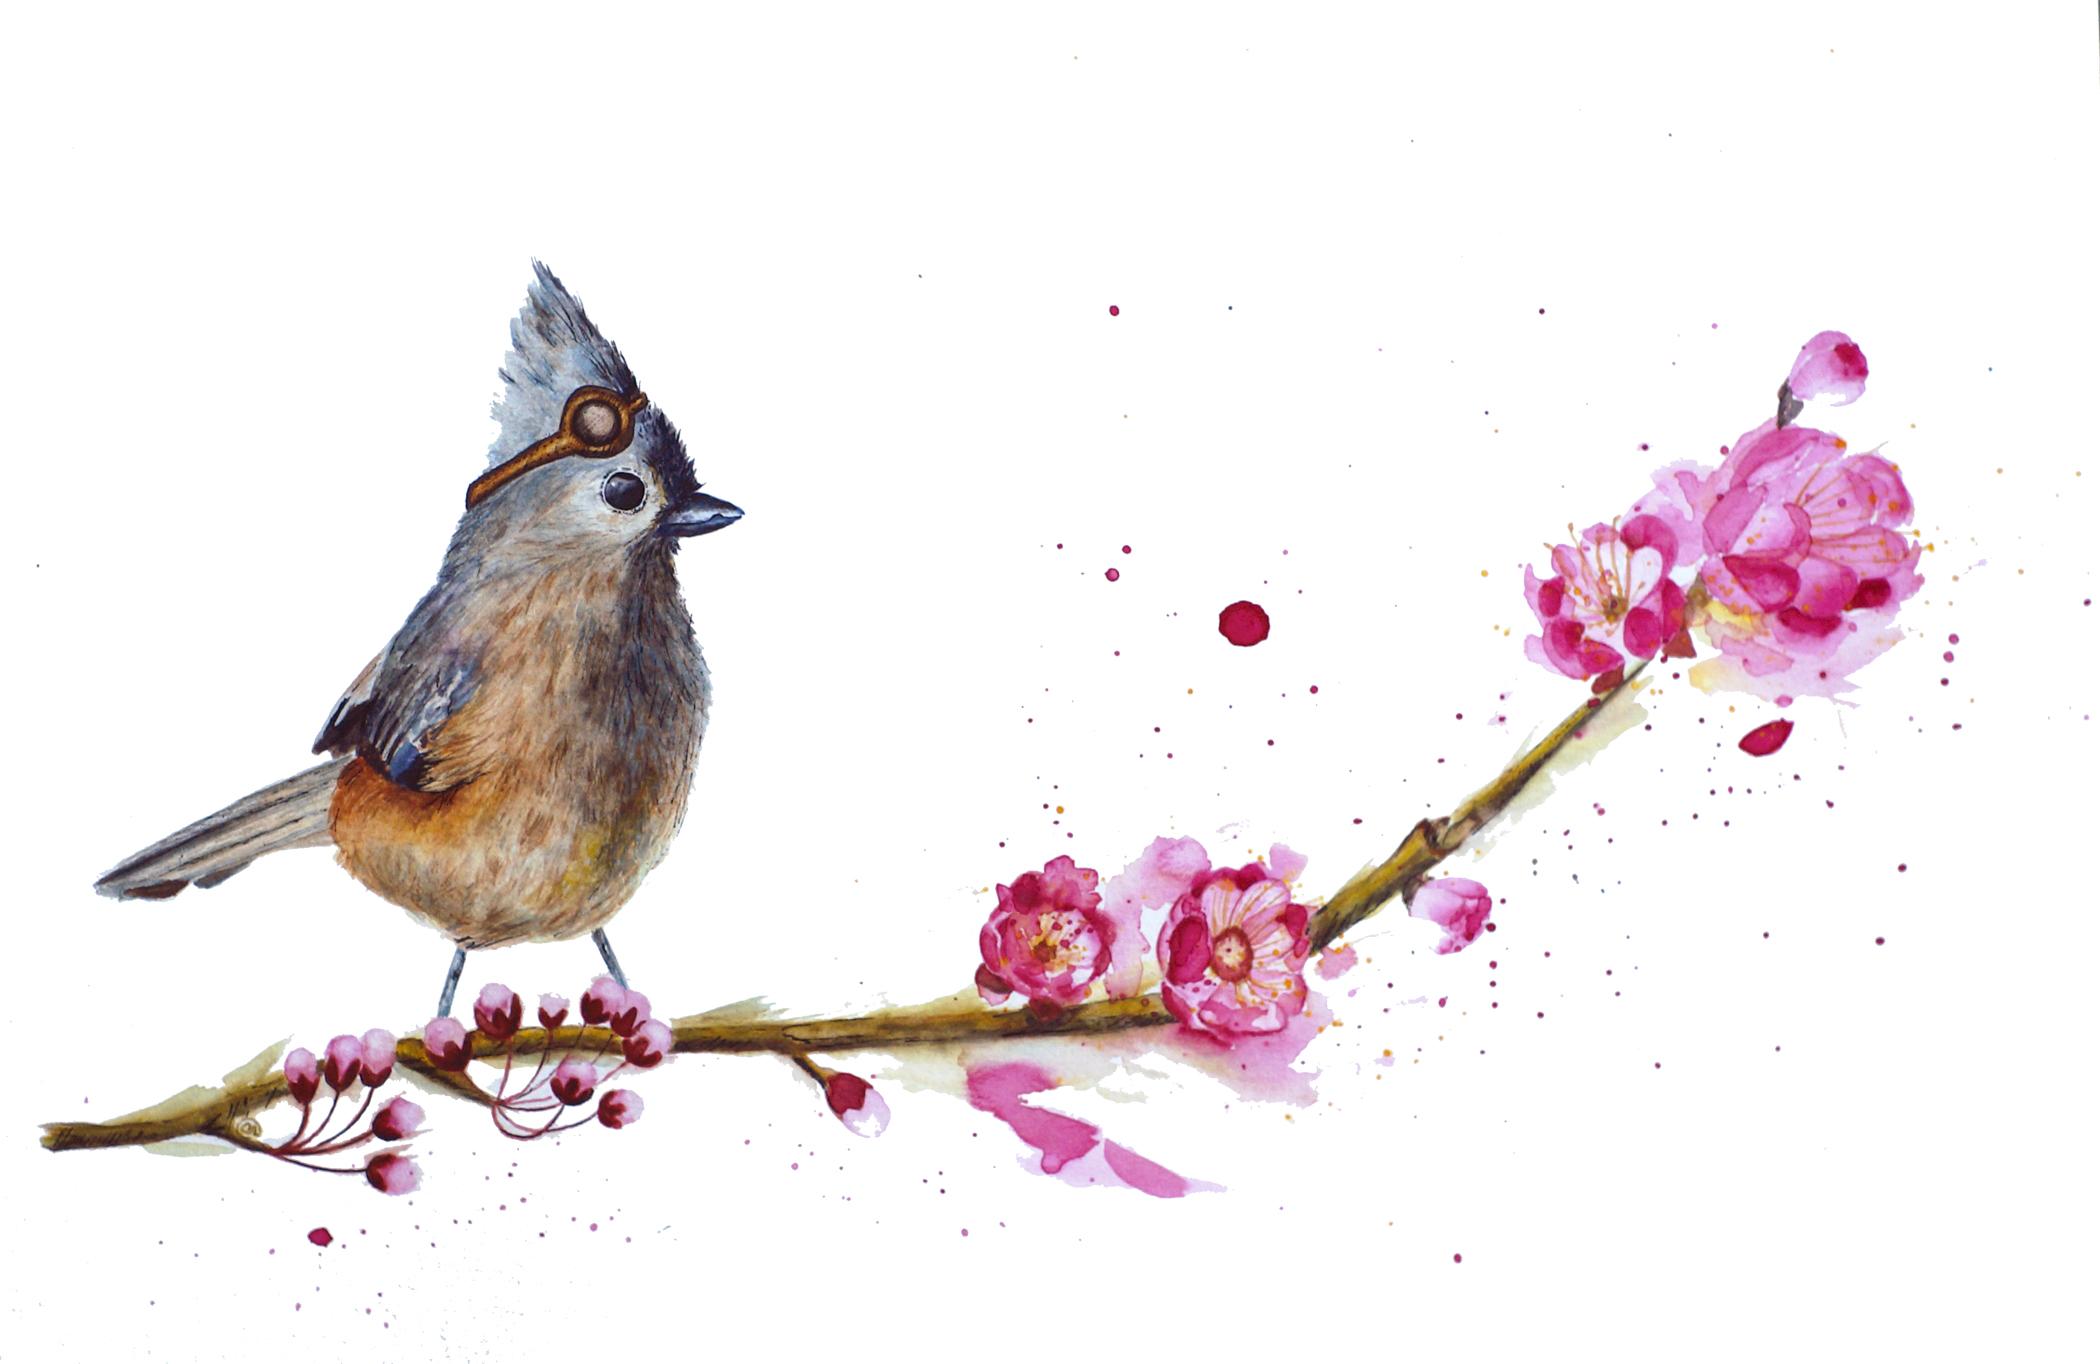 Pilot Bird, Tuffed Titmouse 12x18, Watercolor: $250